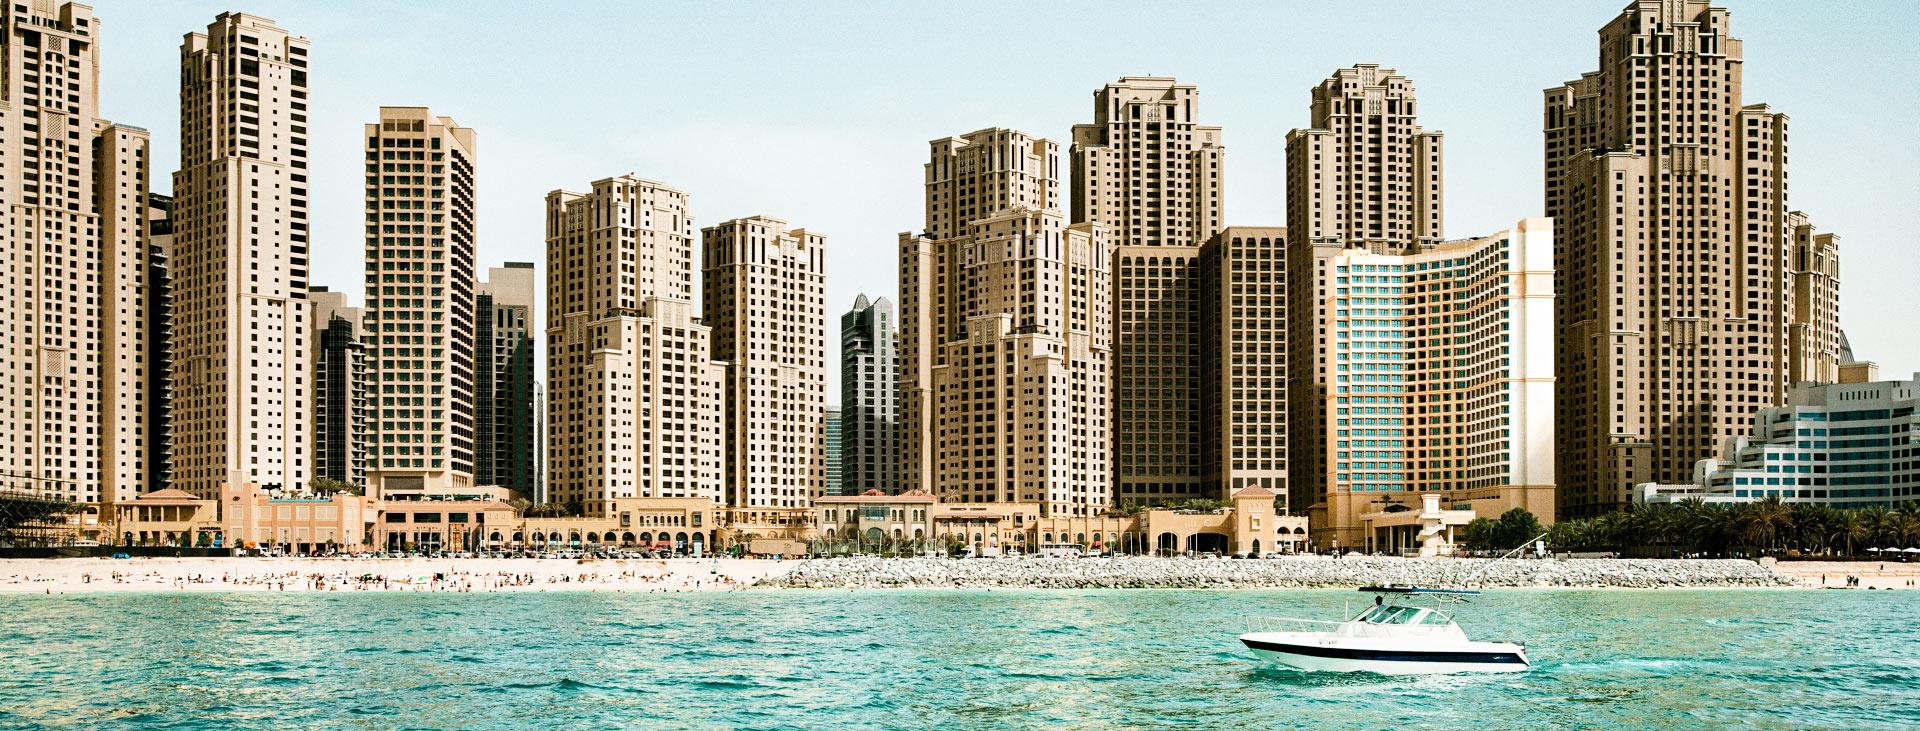 JA Ocean View Hotel, Jumeirah Beach, Dubai, Förenade Arabemiraten